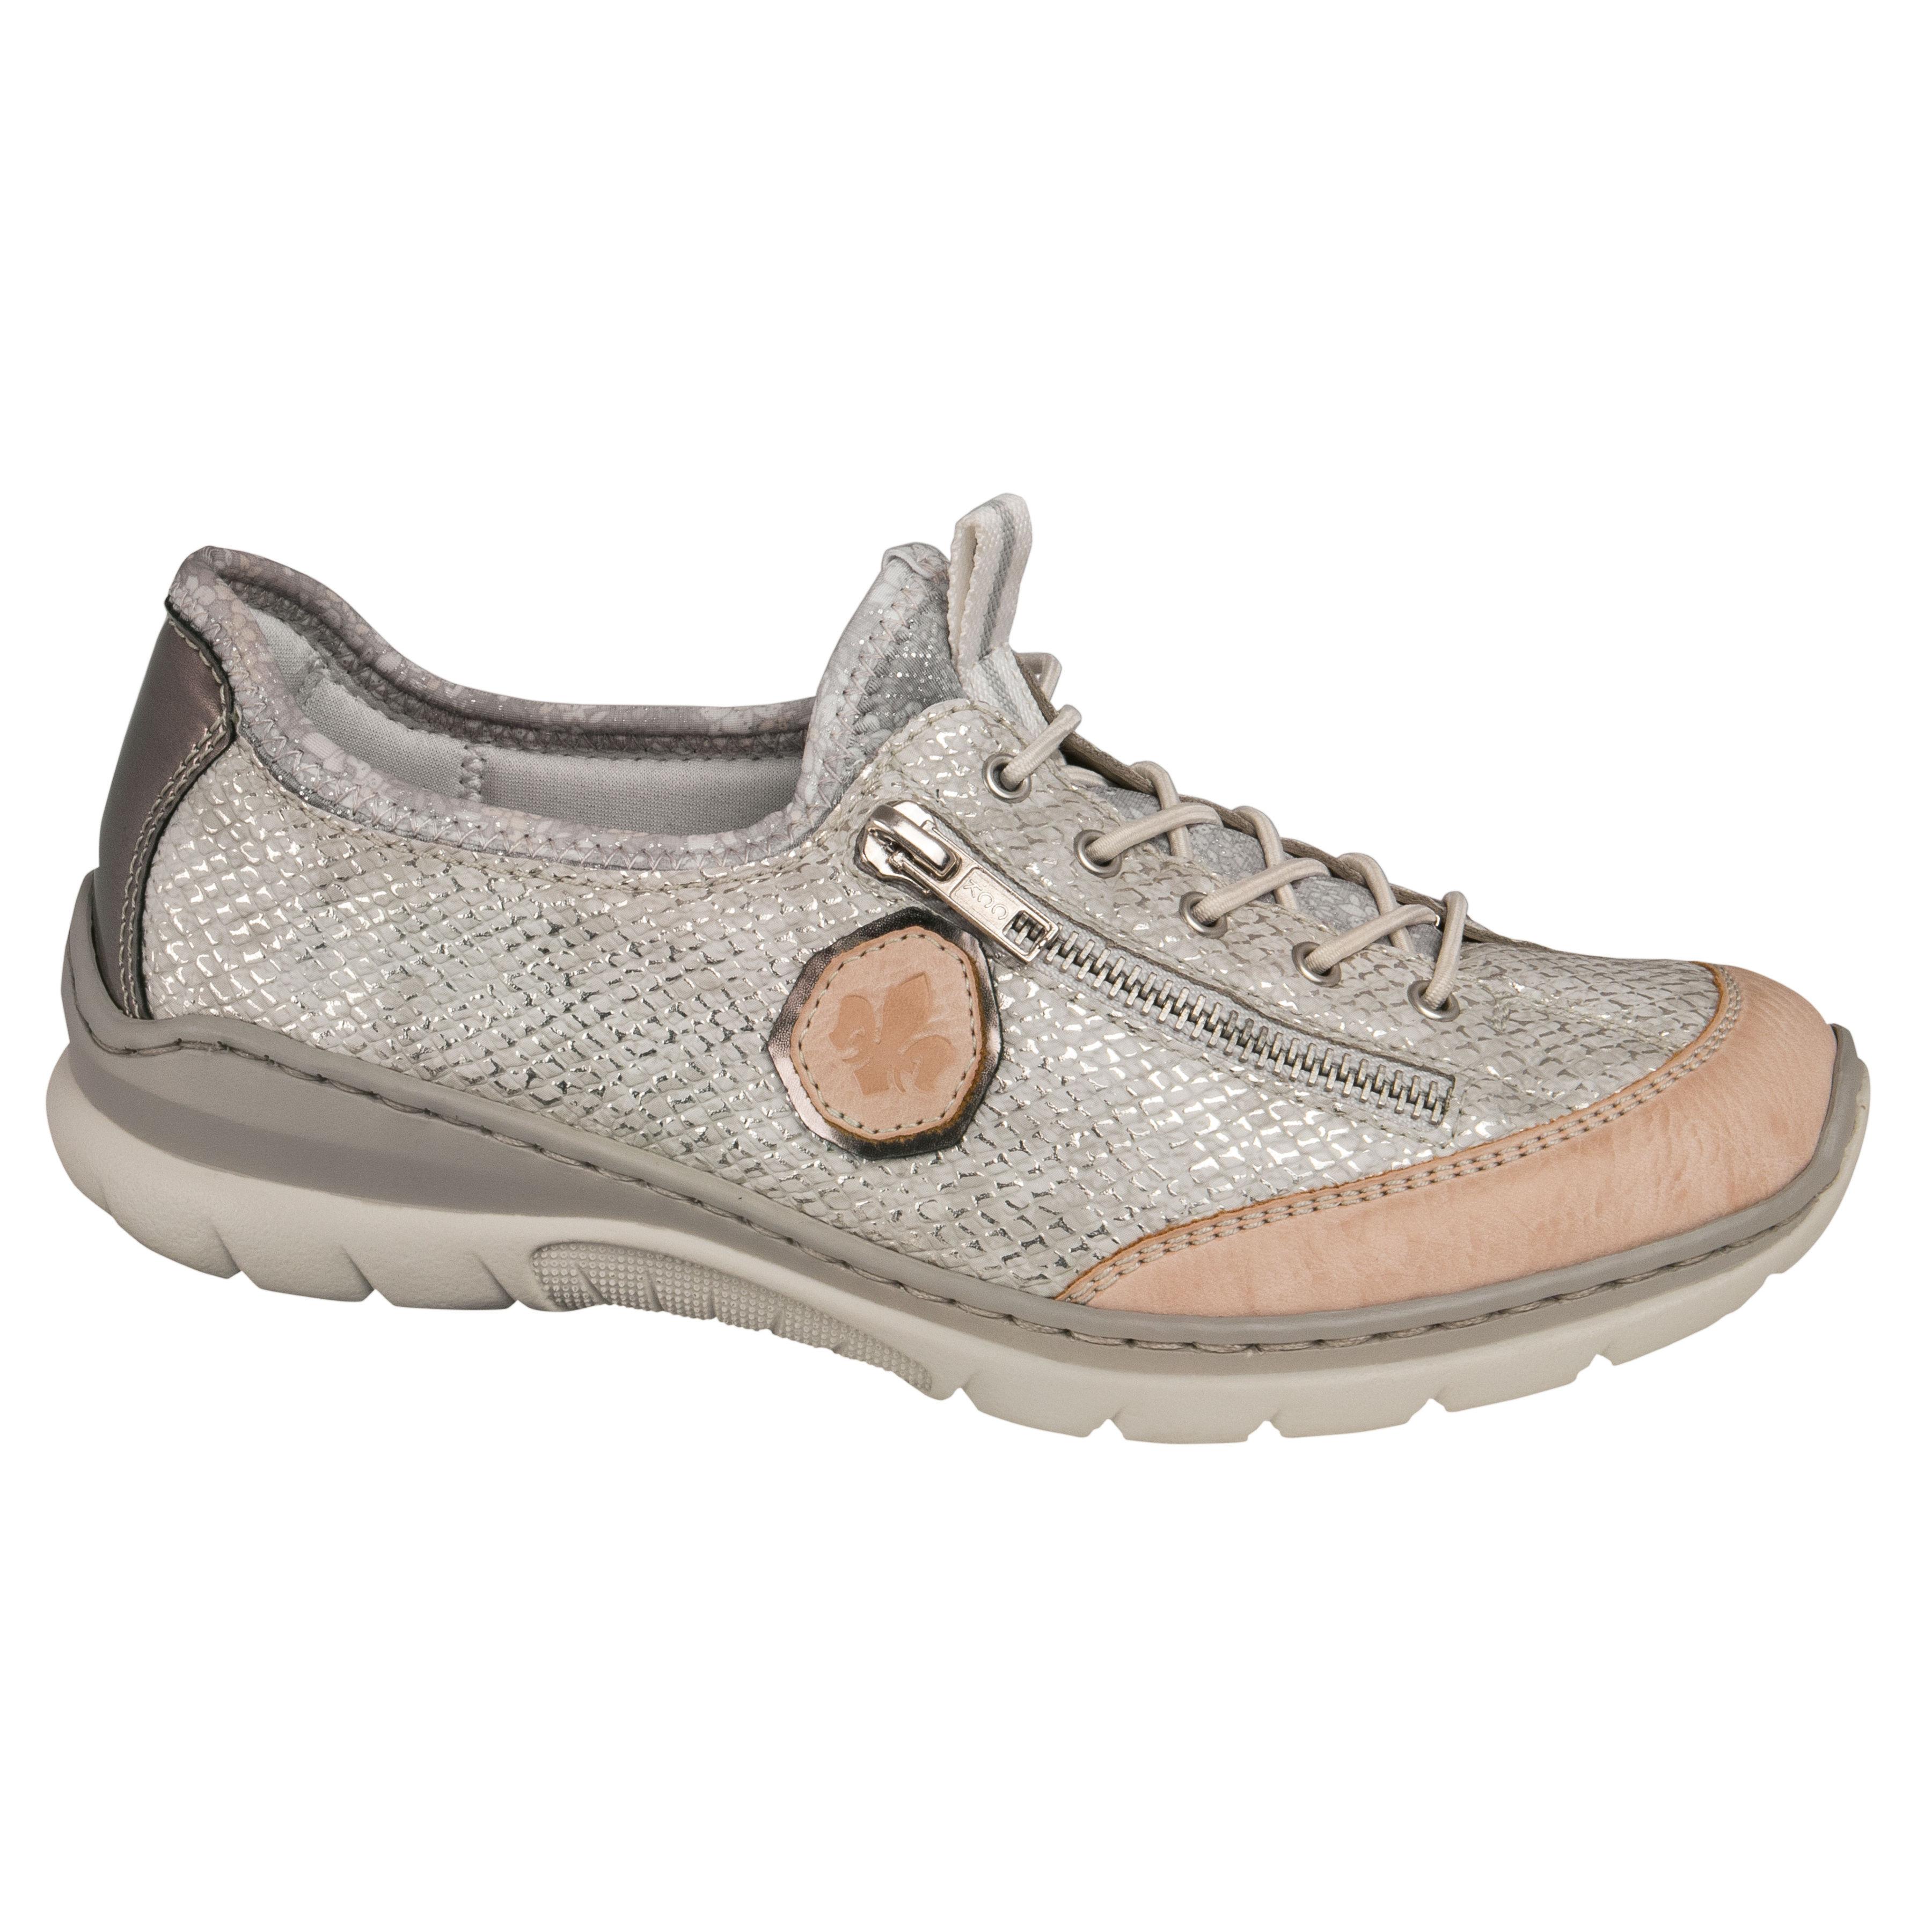 Matière Chaussure En Souple Chaussure Rieker Rieker En Souple Chaussure Matière XZOuwiTPk